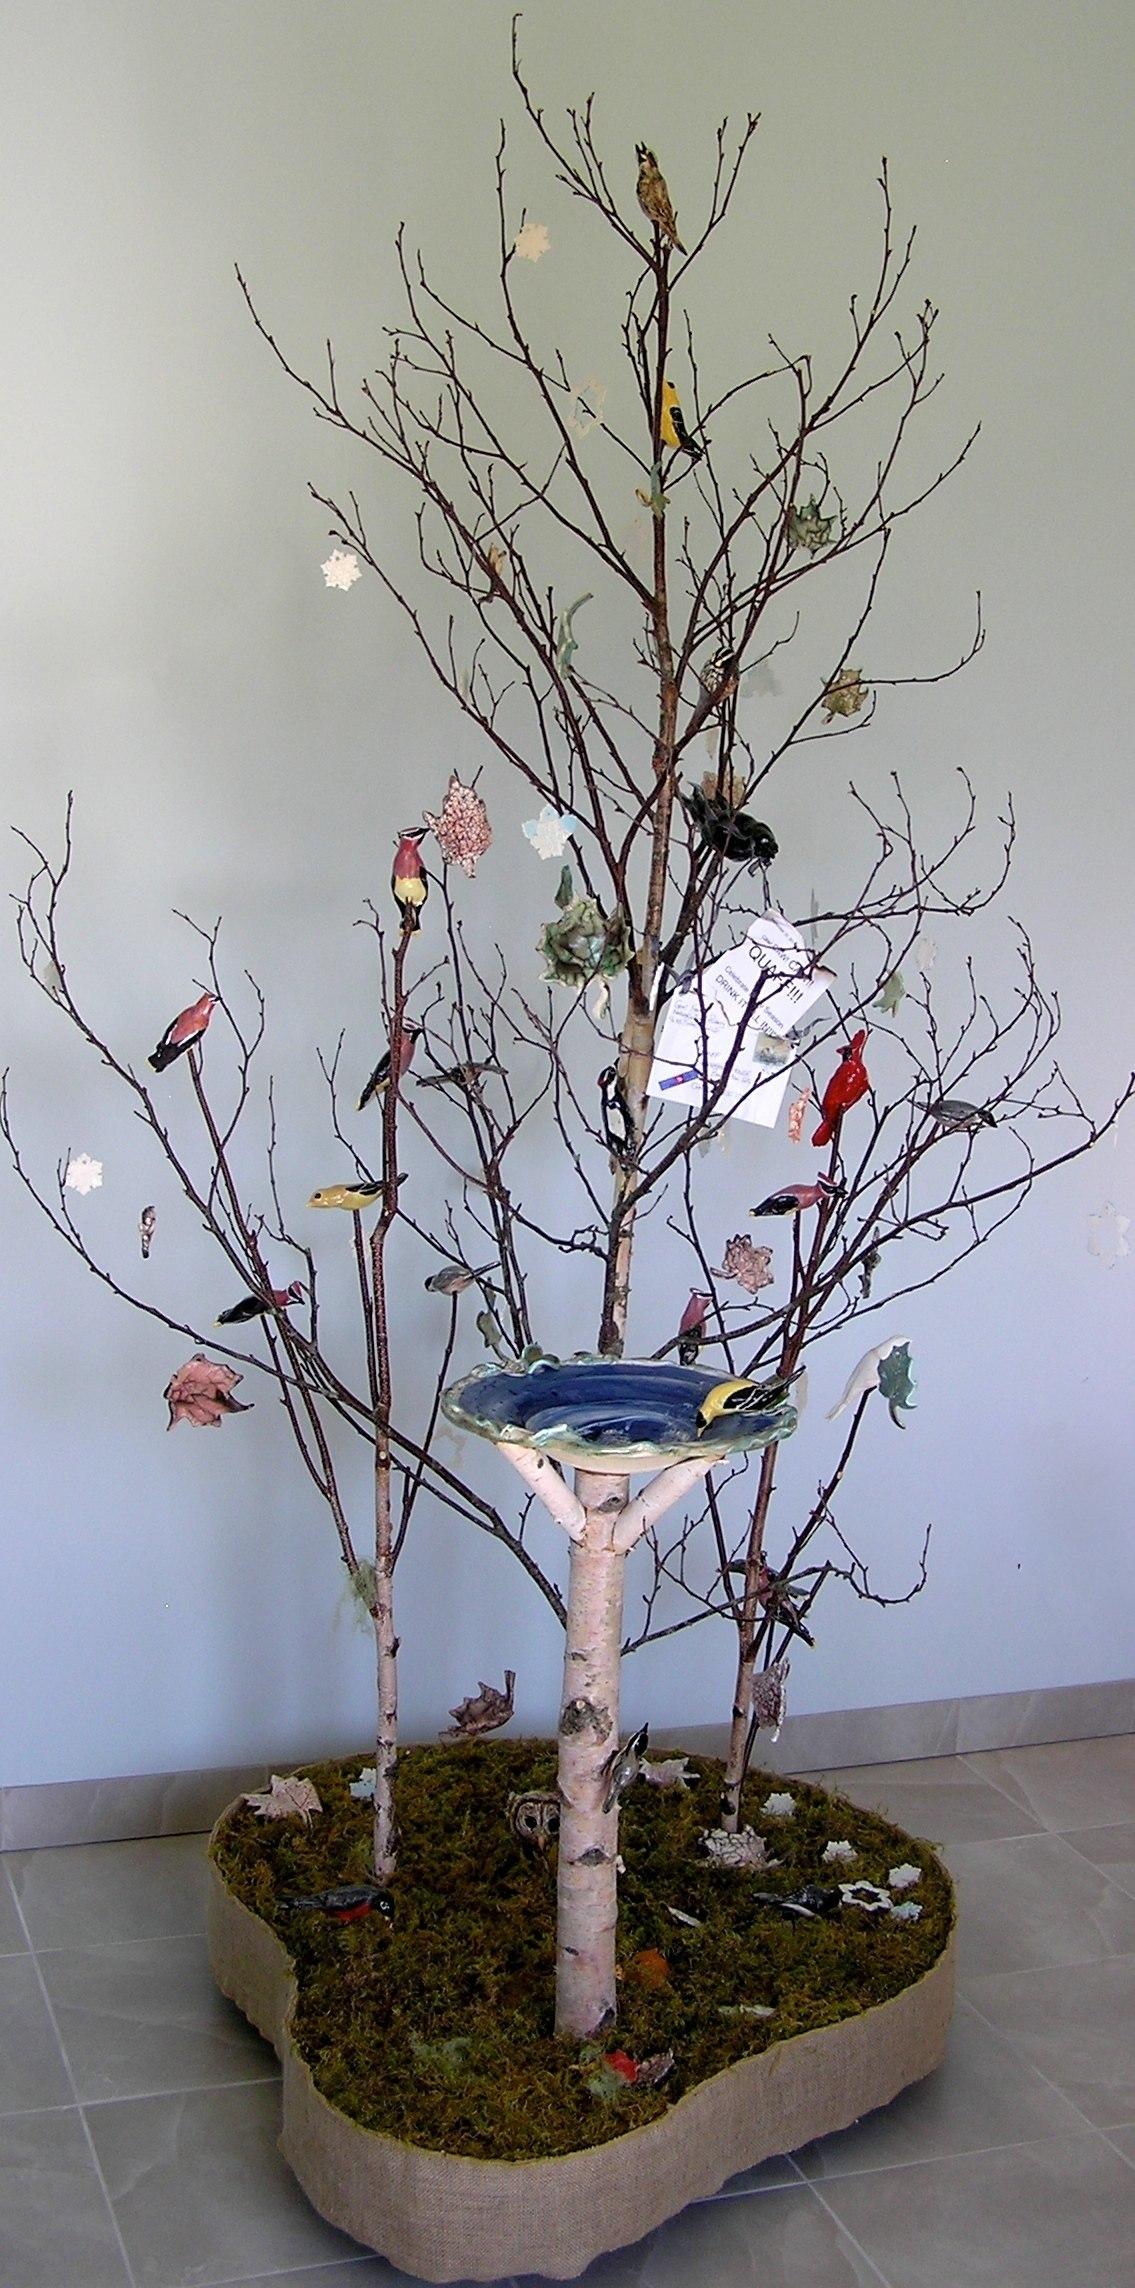 Birds, Bath & Beyond - Gerri Frager